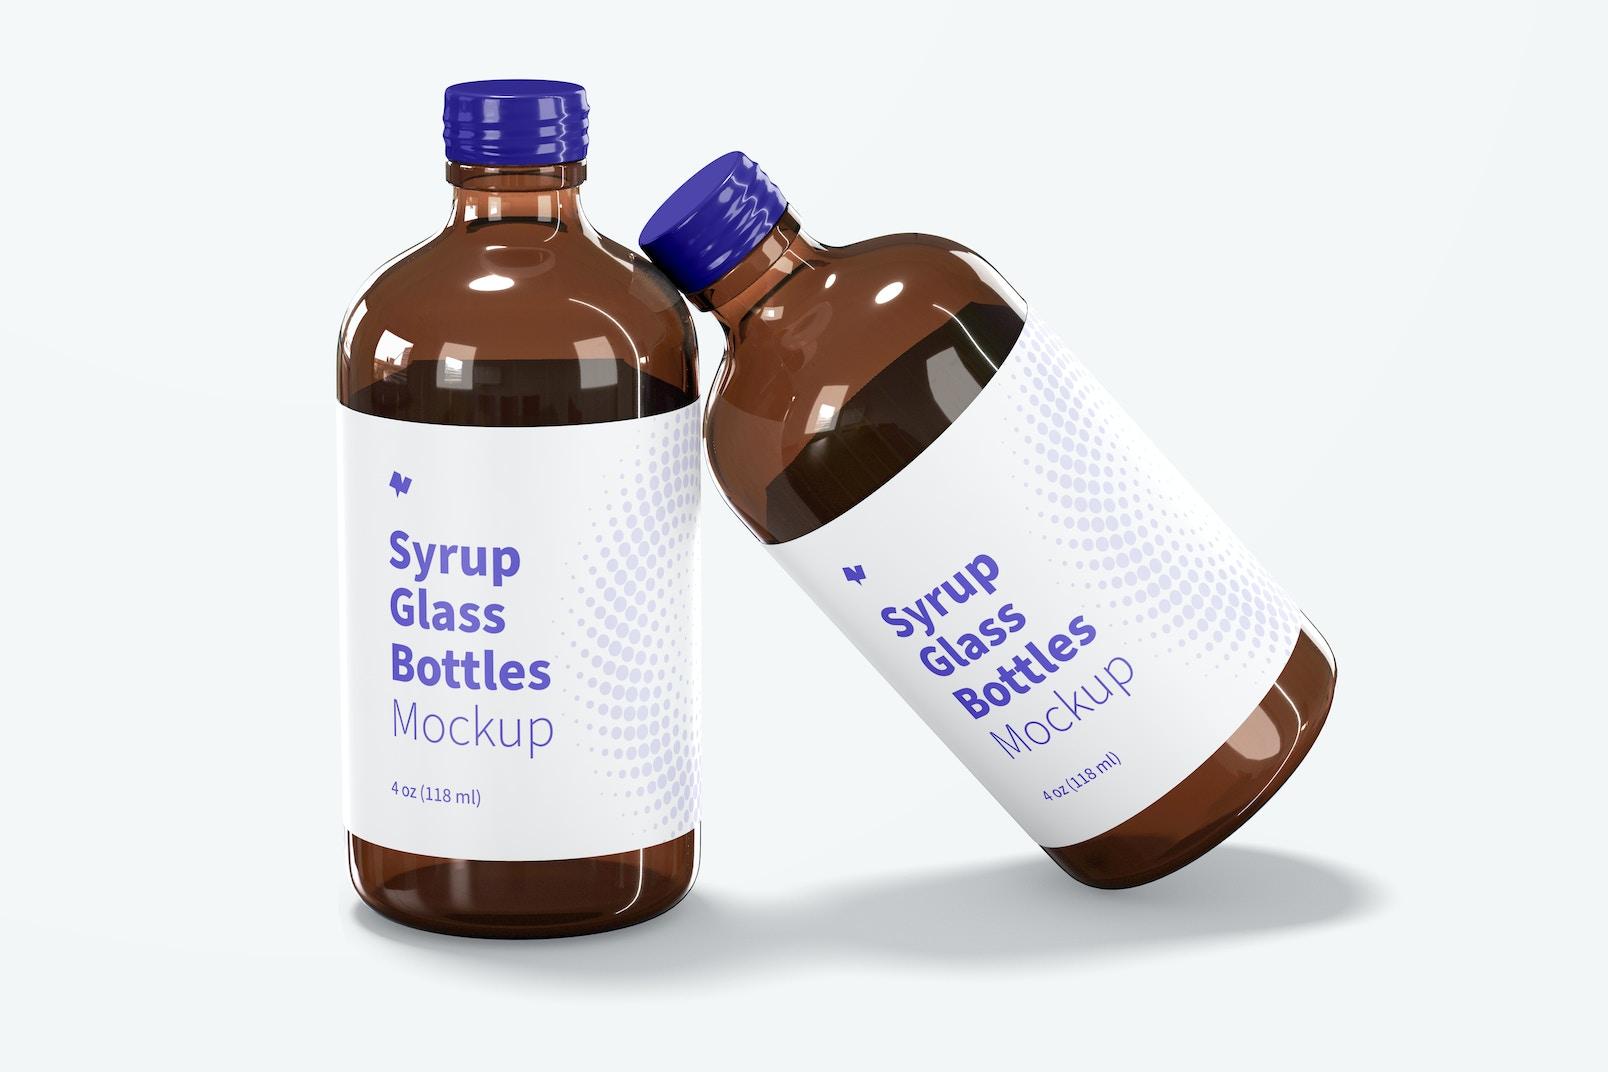 4 oz Syrup Glass Bottles Mockup